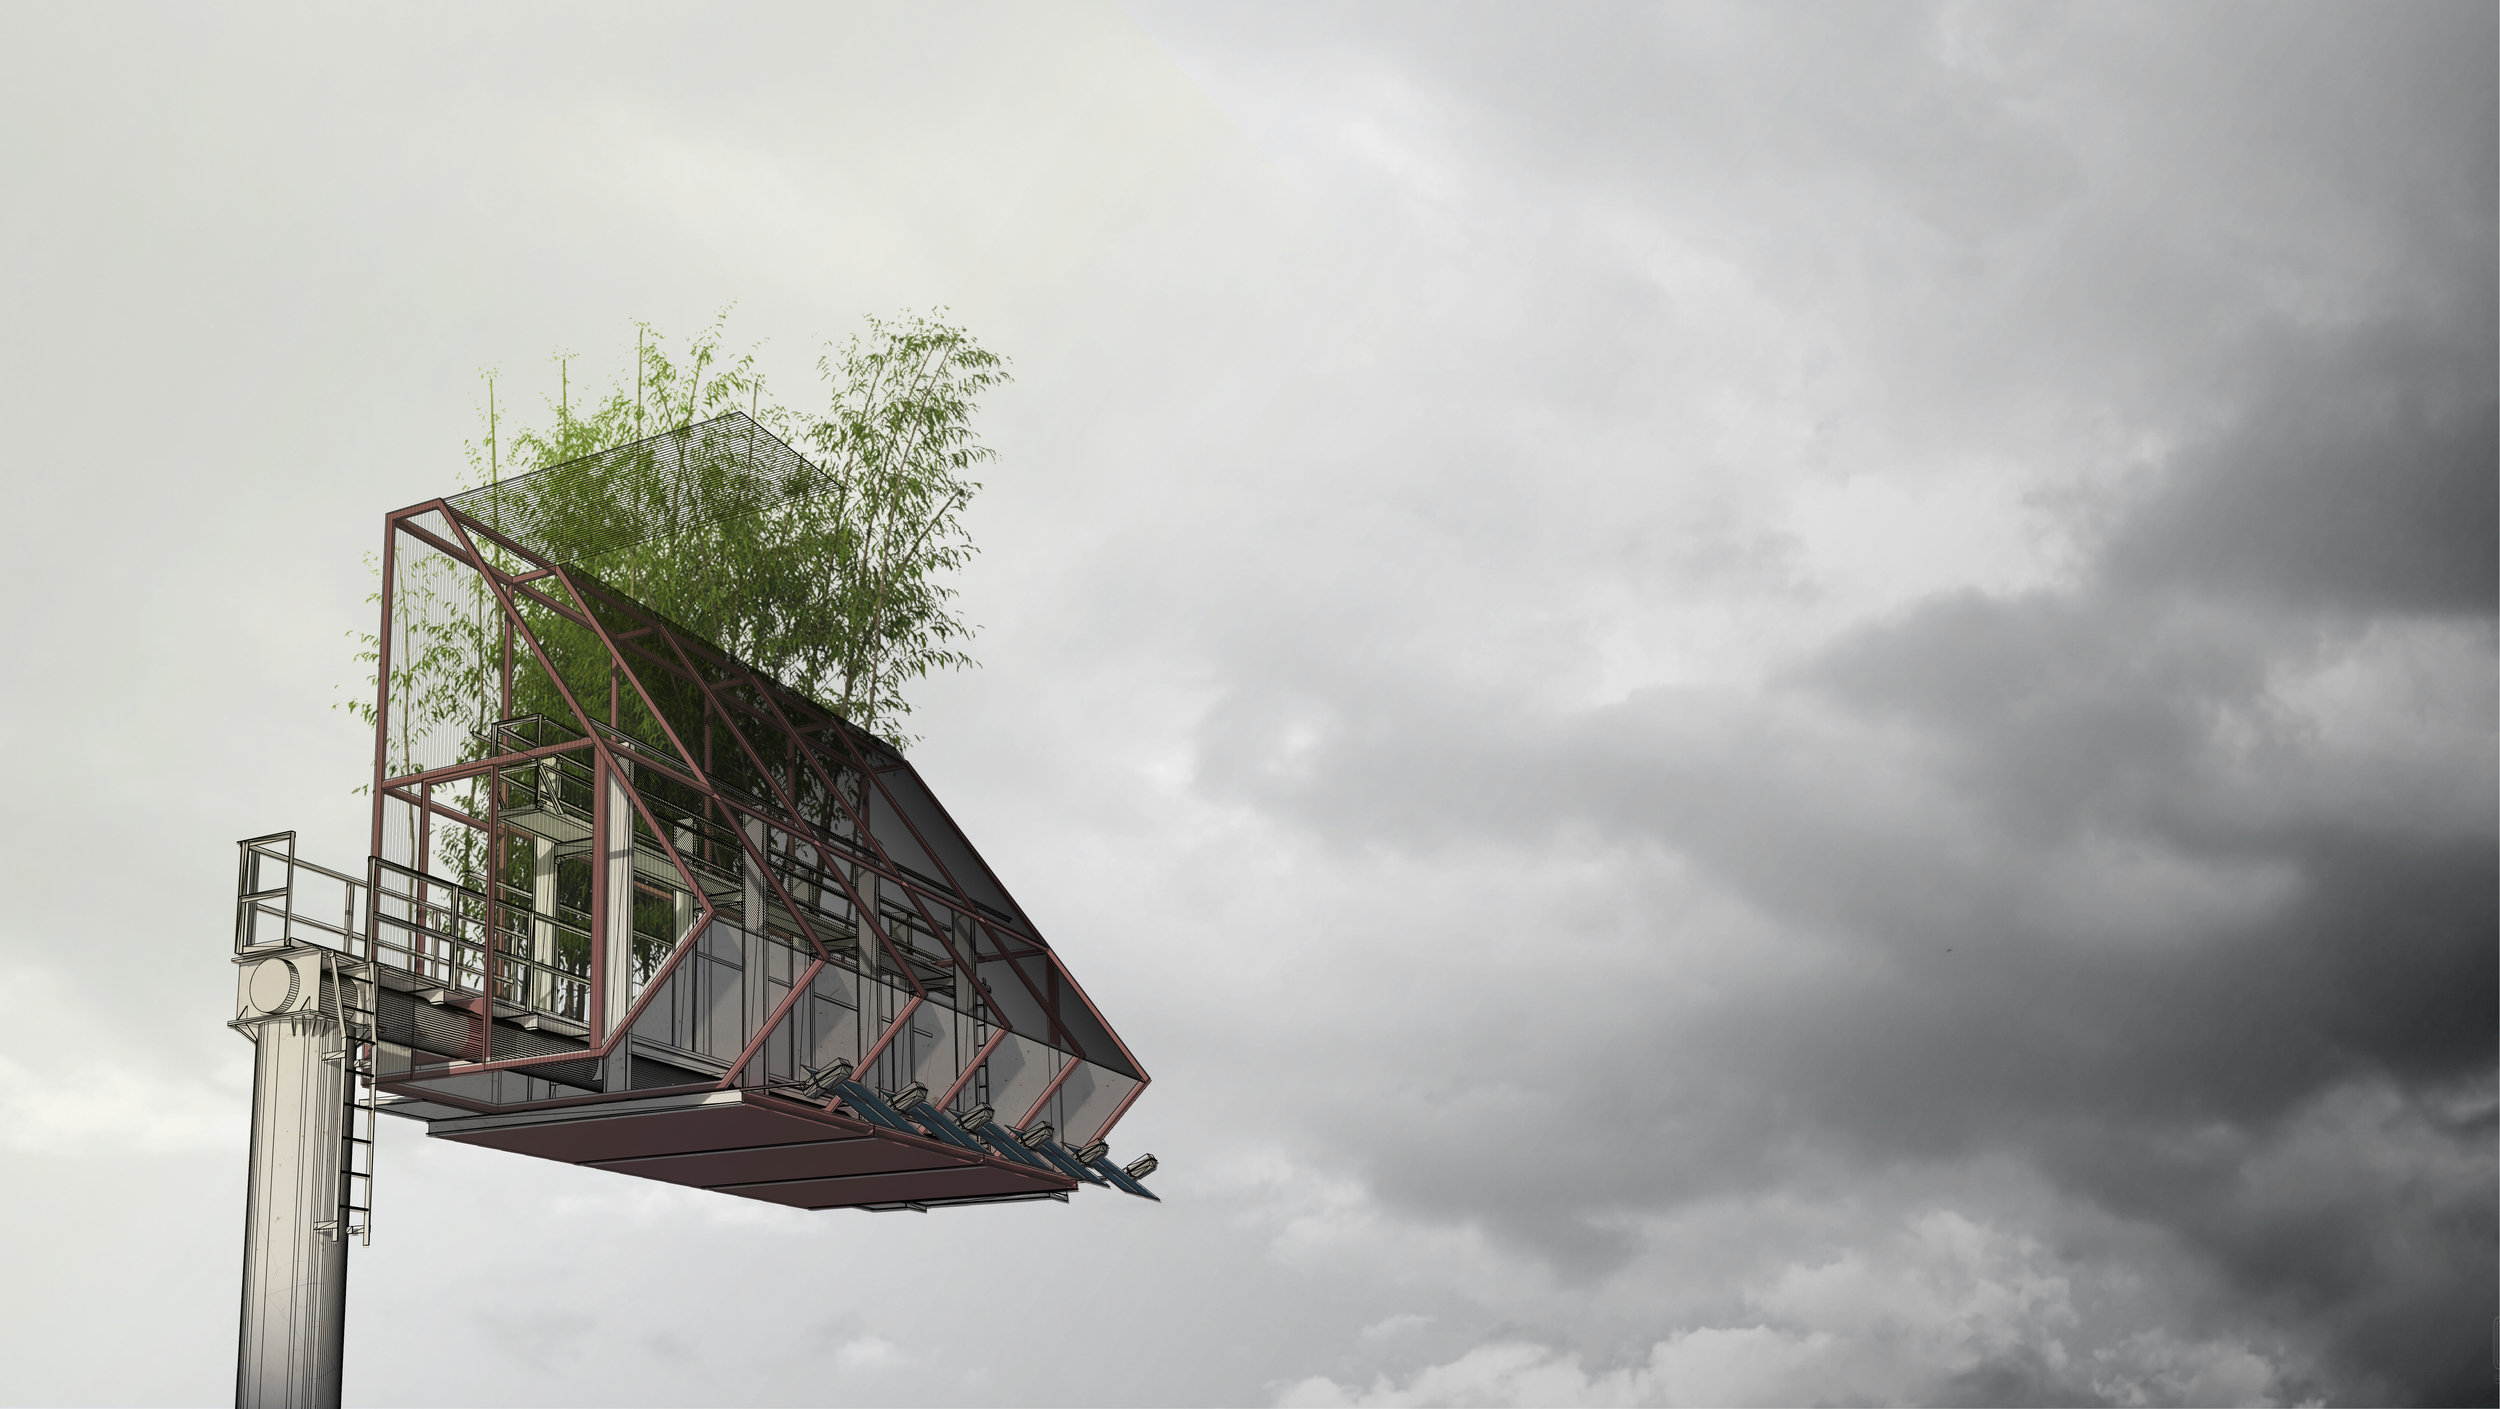 S.E.A.-Studio-Environmental-Architecture-David-Hertz-FAIA-Stephen-Glassman-Open-Air-Los-Angeles-sustainable-regenerative-restorative-green-infrastructure-design-bottle-filling-station-upcycle-billboard-advertising-speculative-art-sculpture-bamboo-4.jpg